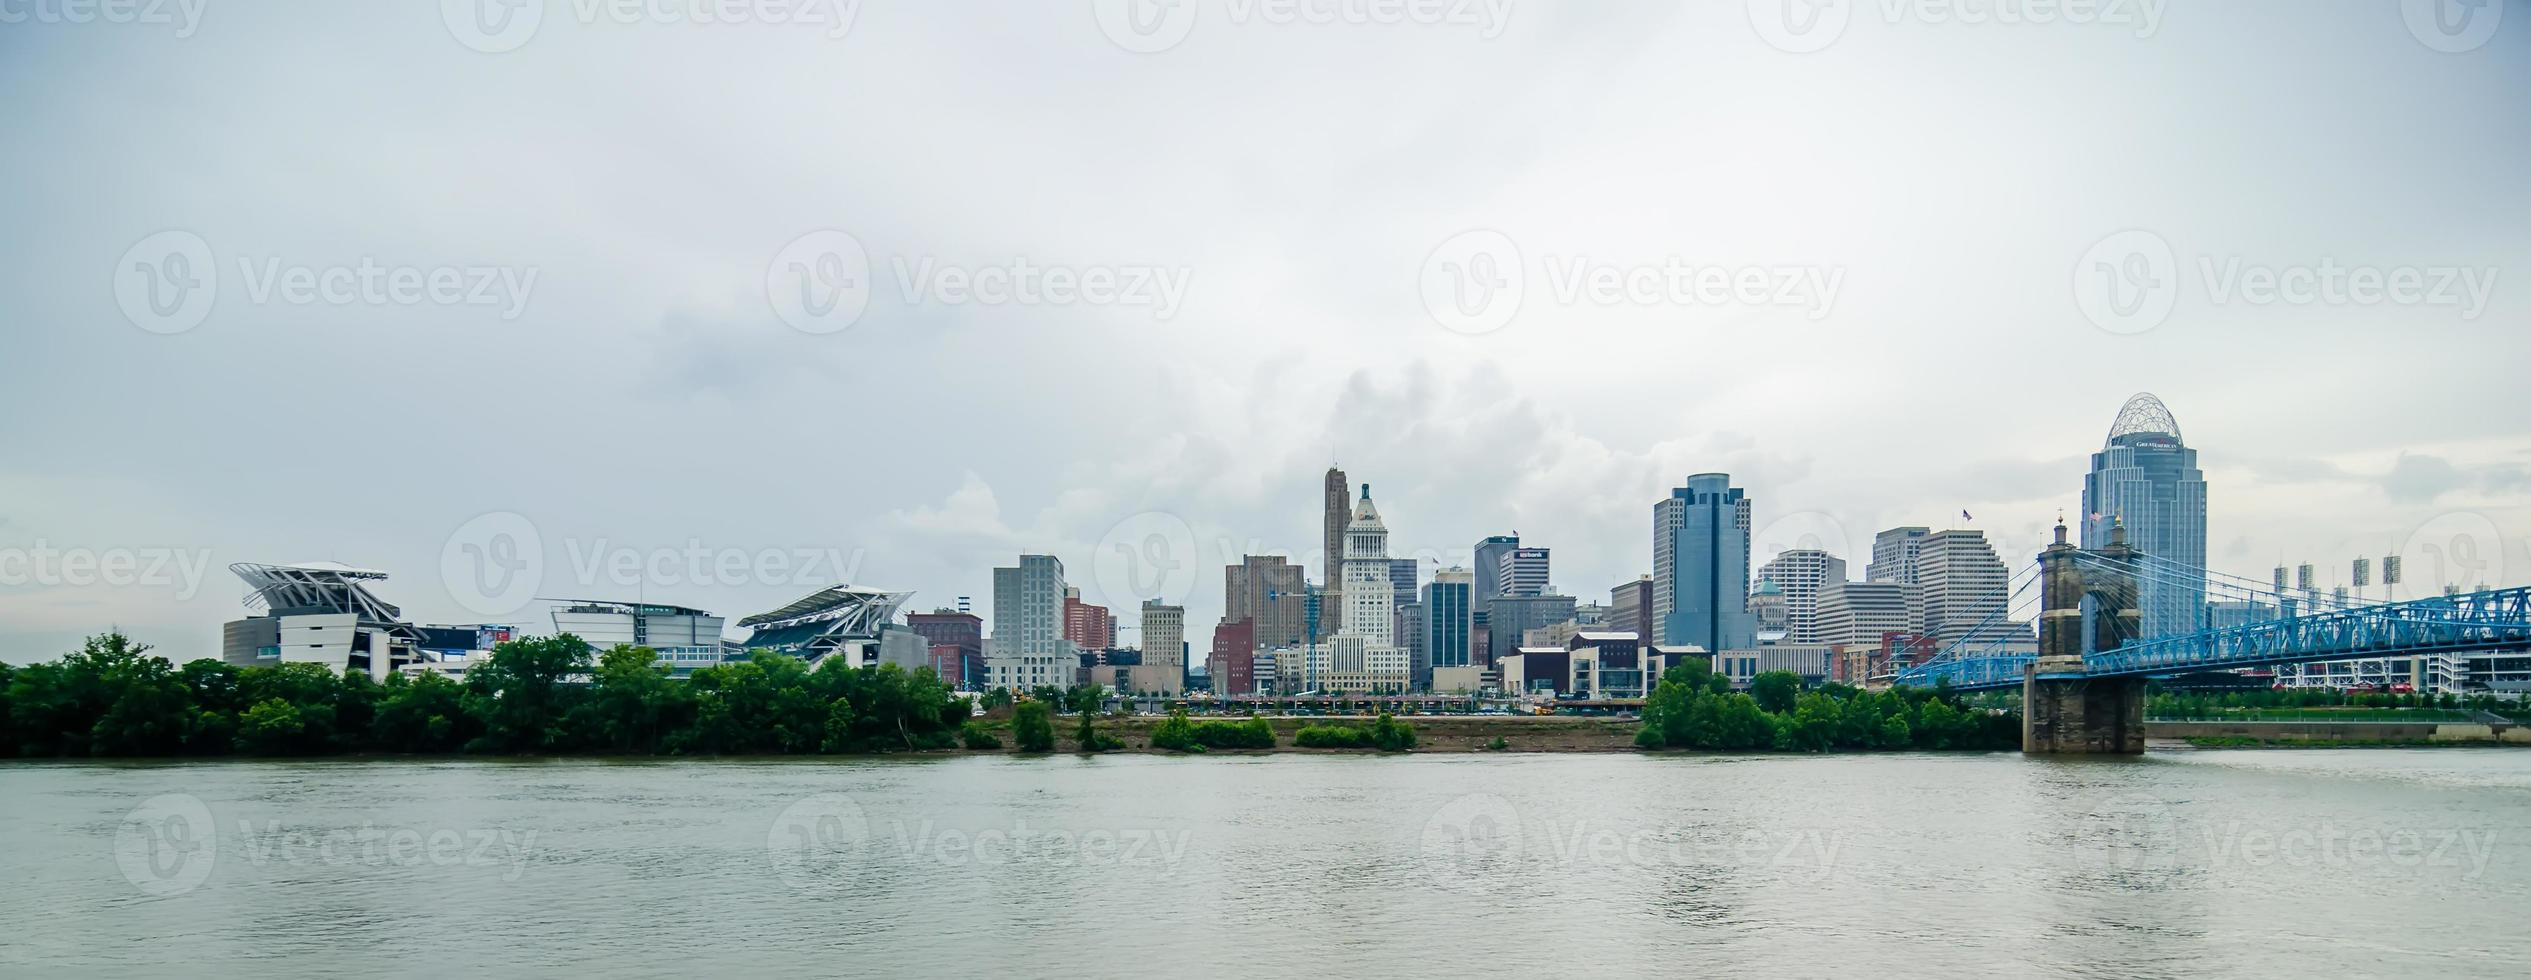 Cincinnati Skyline und historischer John a. Roebling Hängebrücke foto